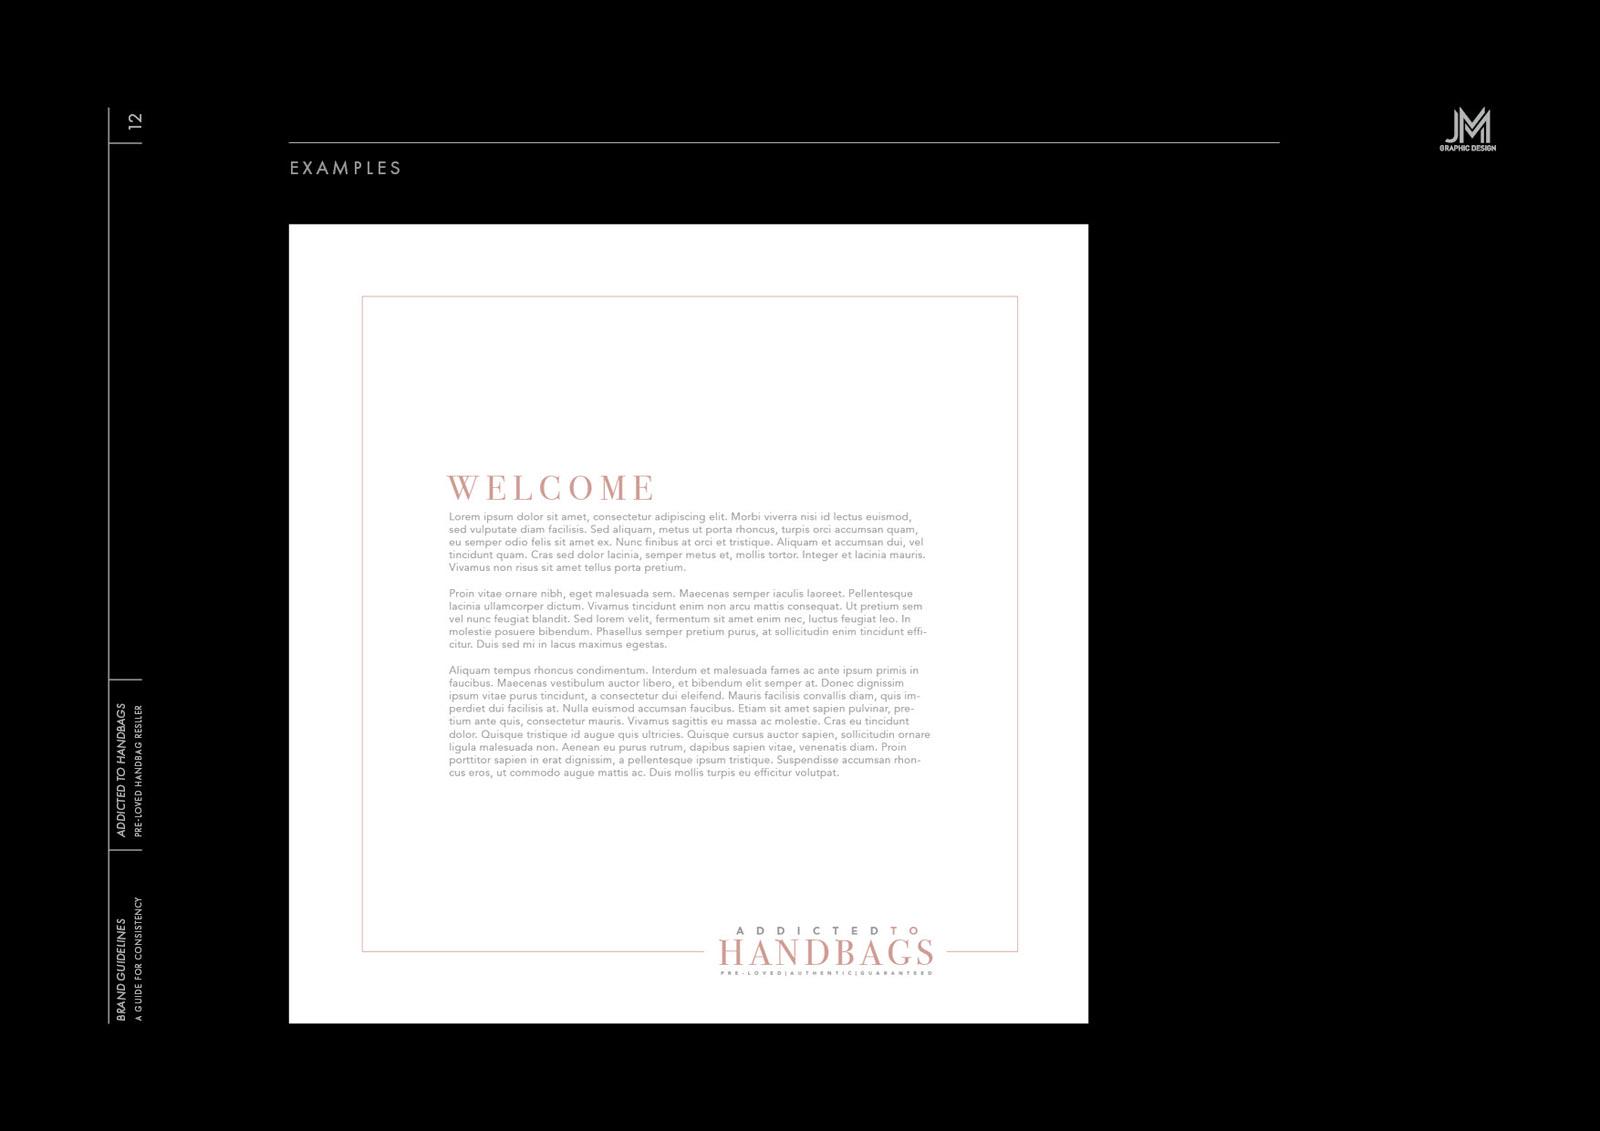 handbag-luxury-brand-identity-logo-design10